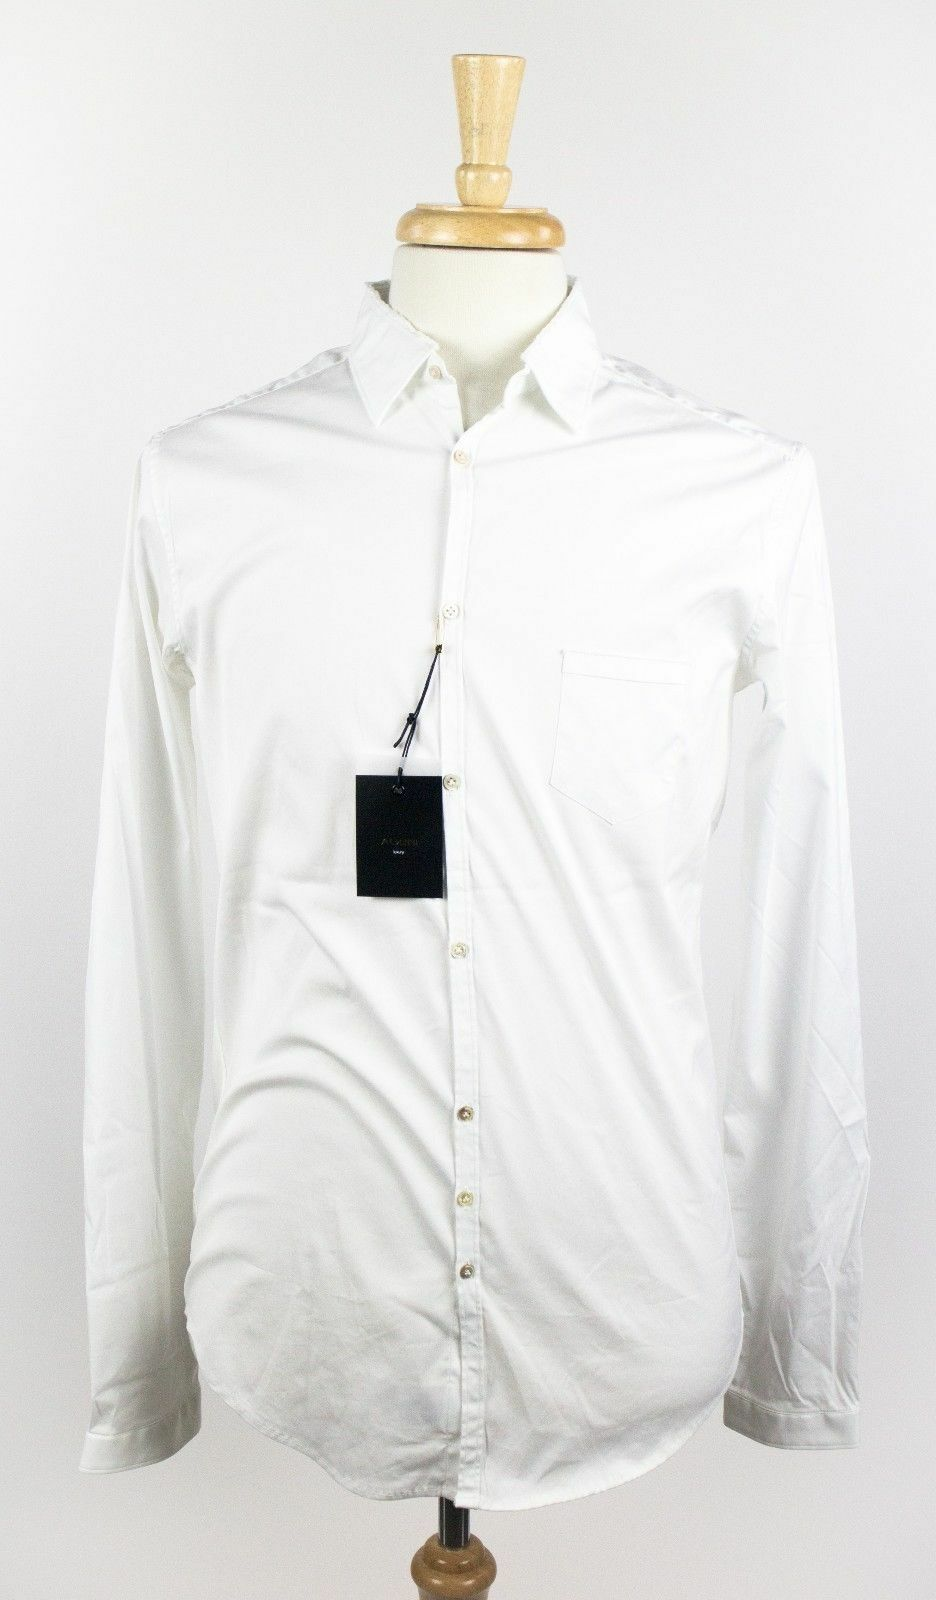 Nwt Aglini Aglini Aglini Weiß Baumwollmischung Freizeit Knöpfe Langärmeliges Top Größe | Innovation  5fef5d